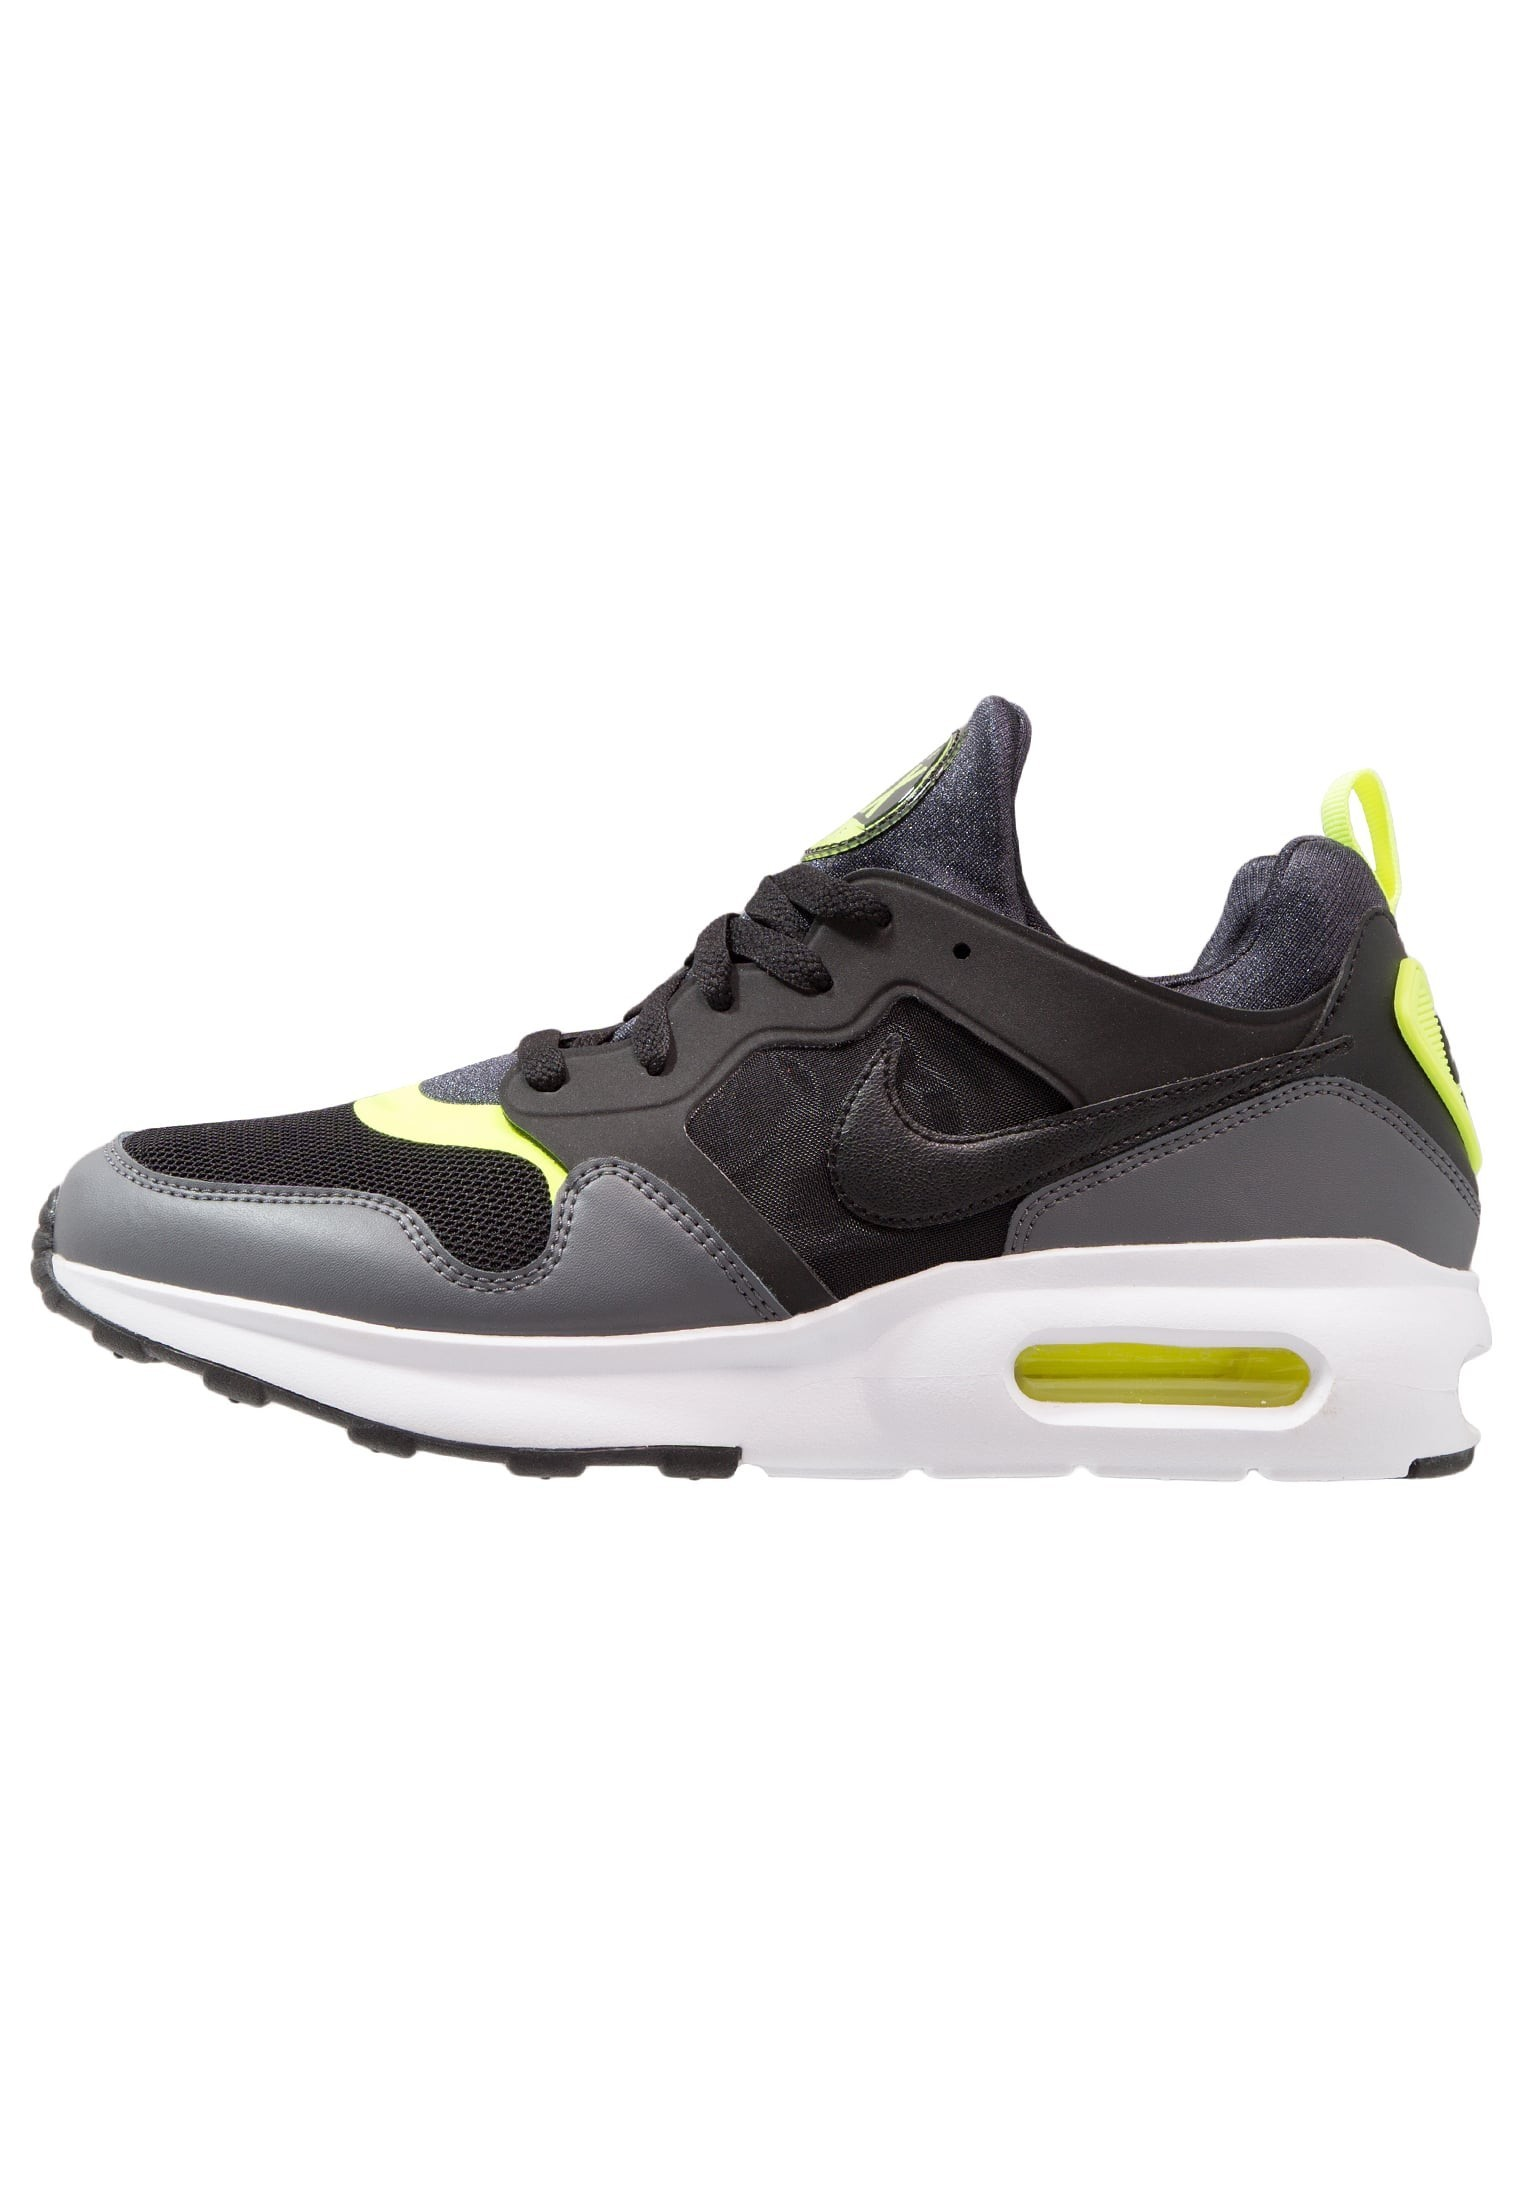 designer fashion 380c0 b4cfc Nike Air Max Prime Schuhe Low NIKsf4x-Grün